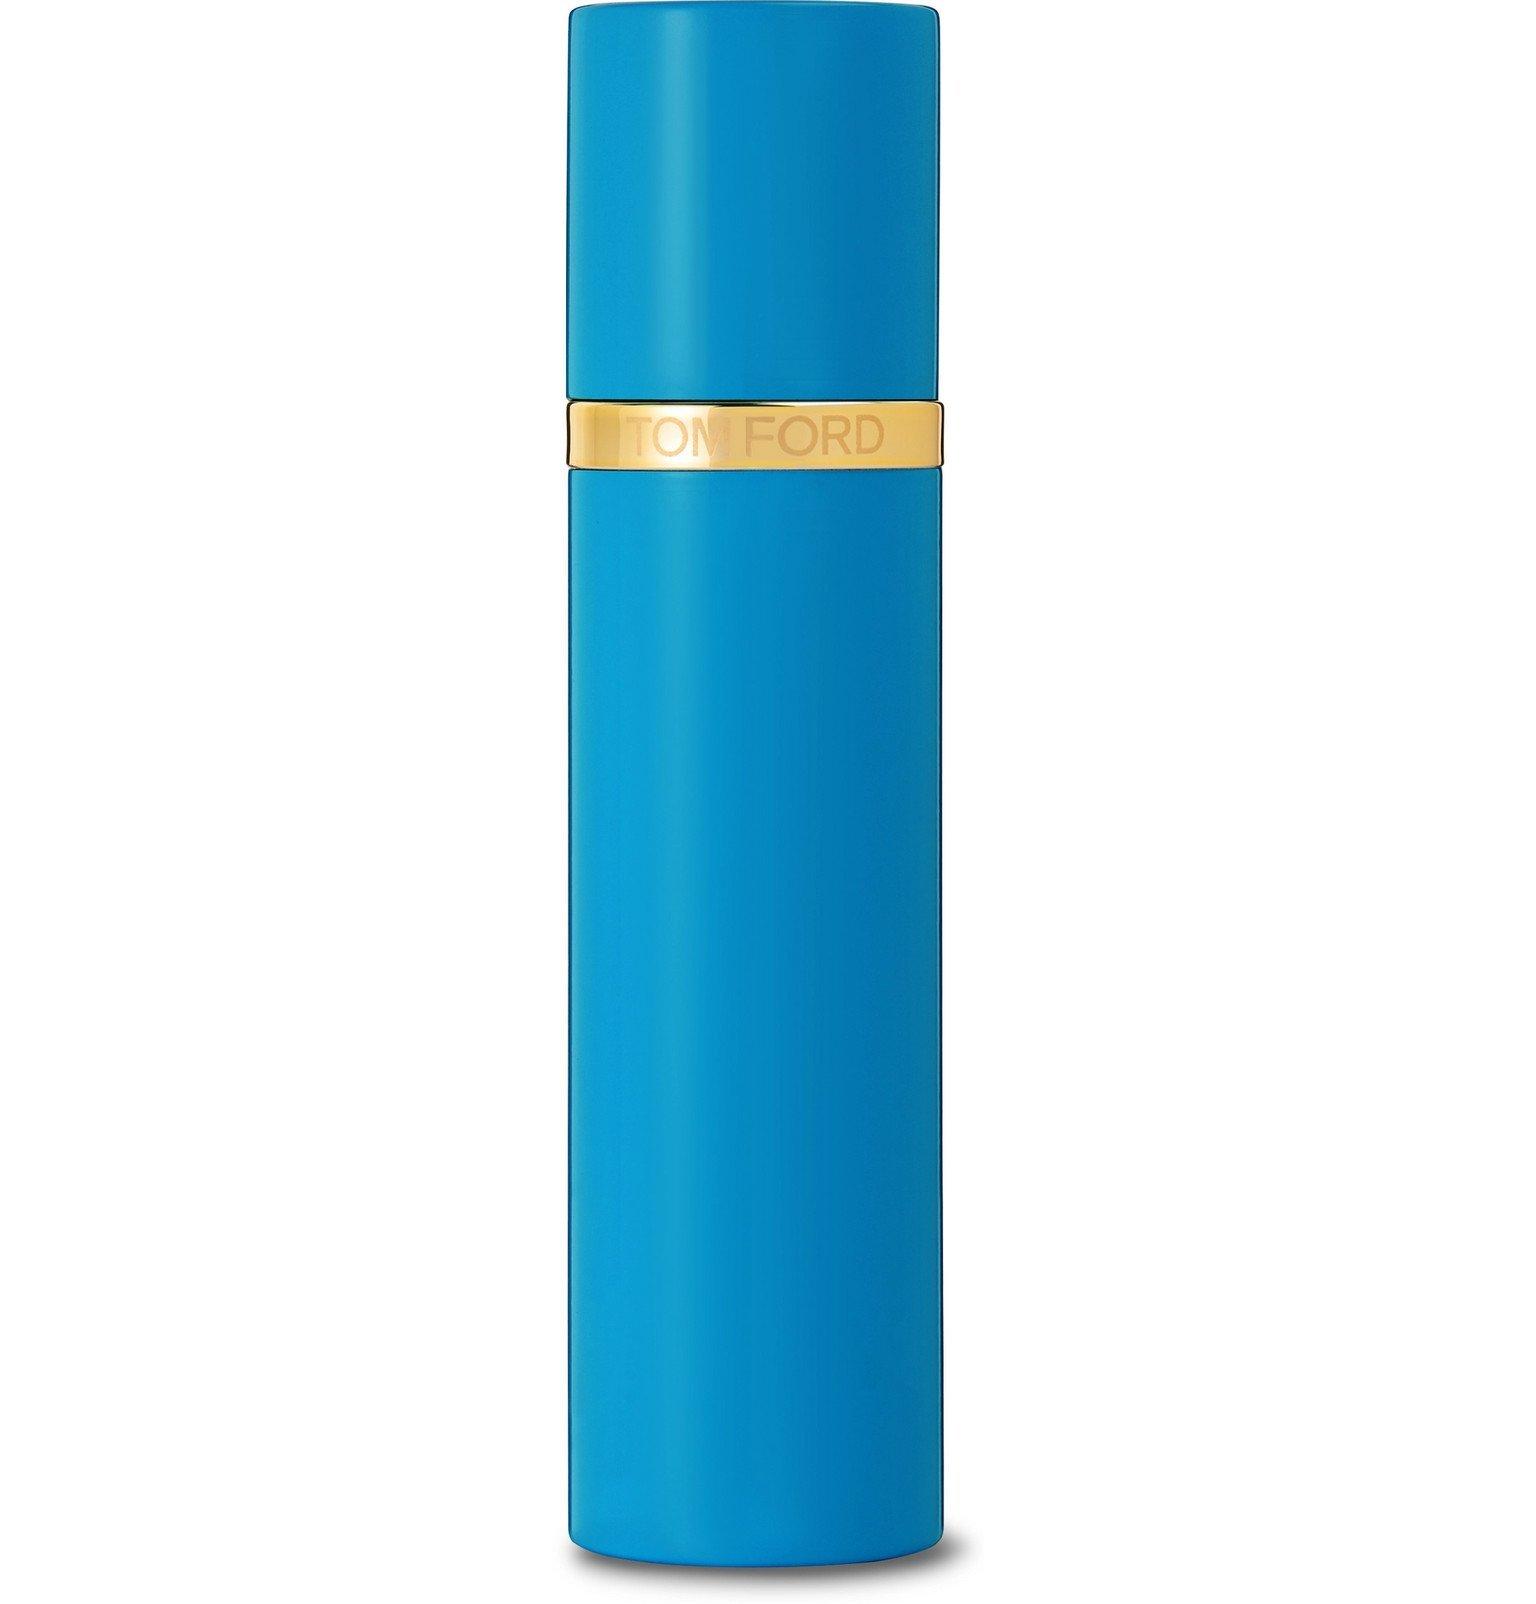 Photo: TOM FORD BEAUTY - Costa Azzurra Eau de Parfum Atomizer, 10ml - Colorless